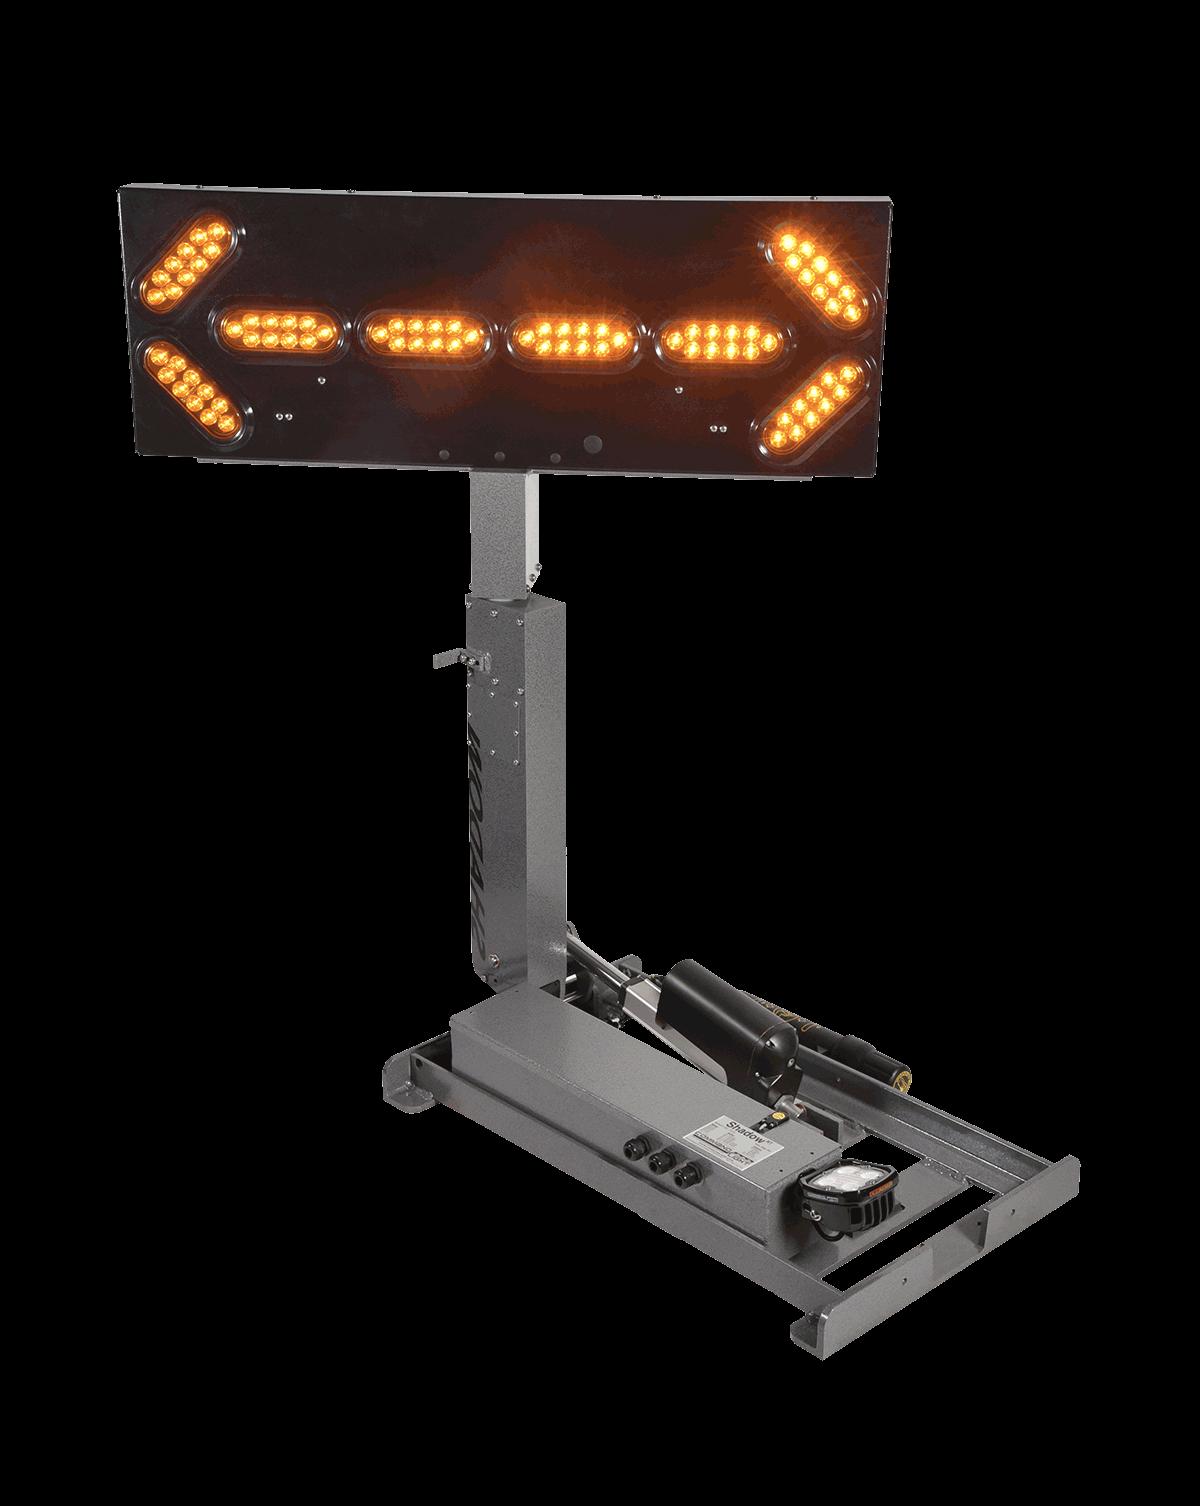 Command Light, Traffic Flow Board, LED Light Tower, Fire Truck Lights